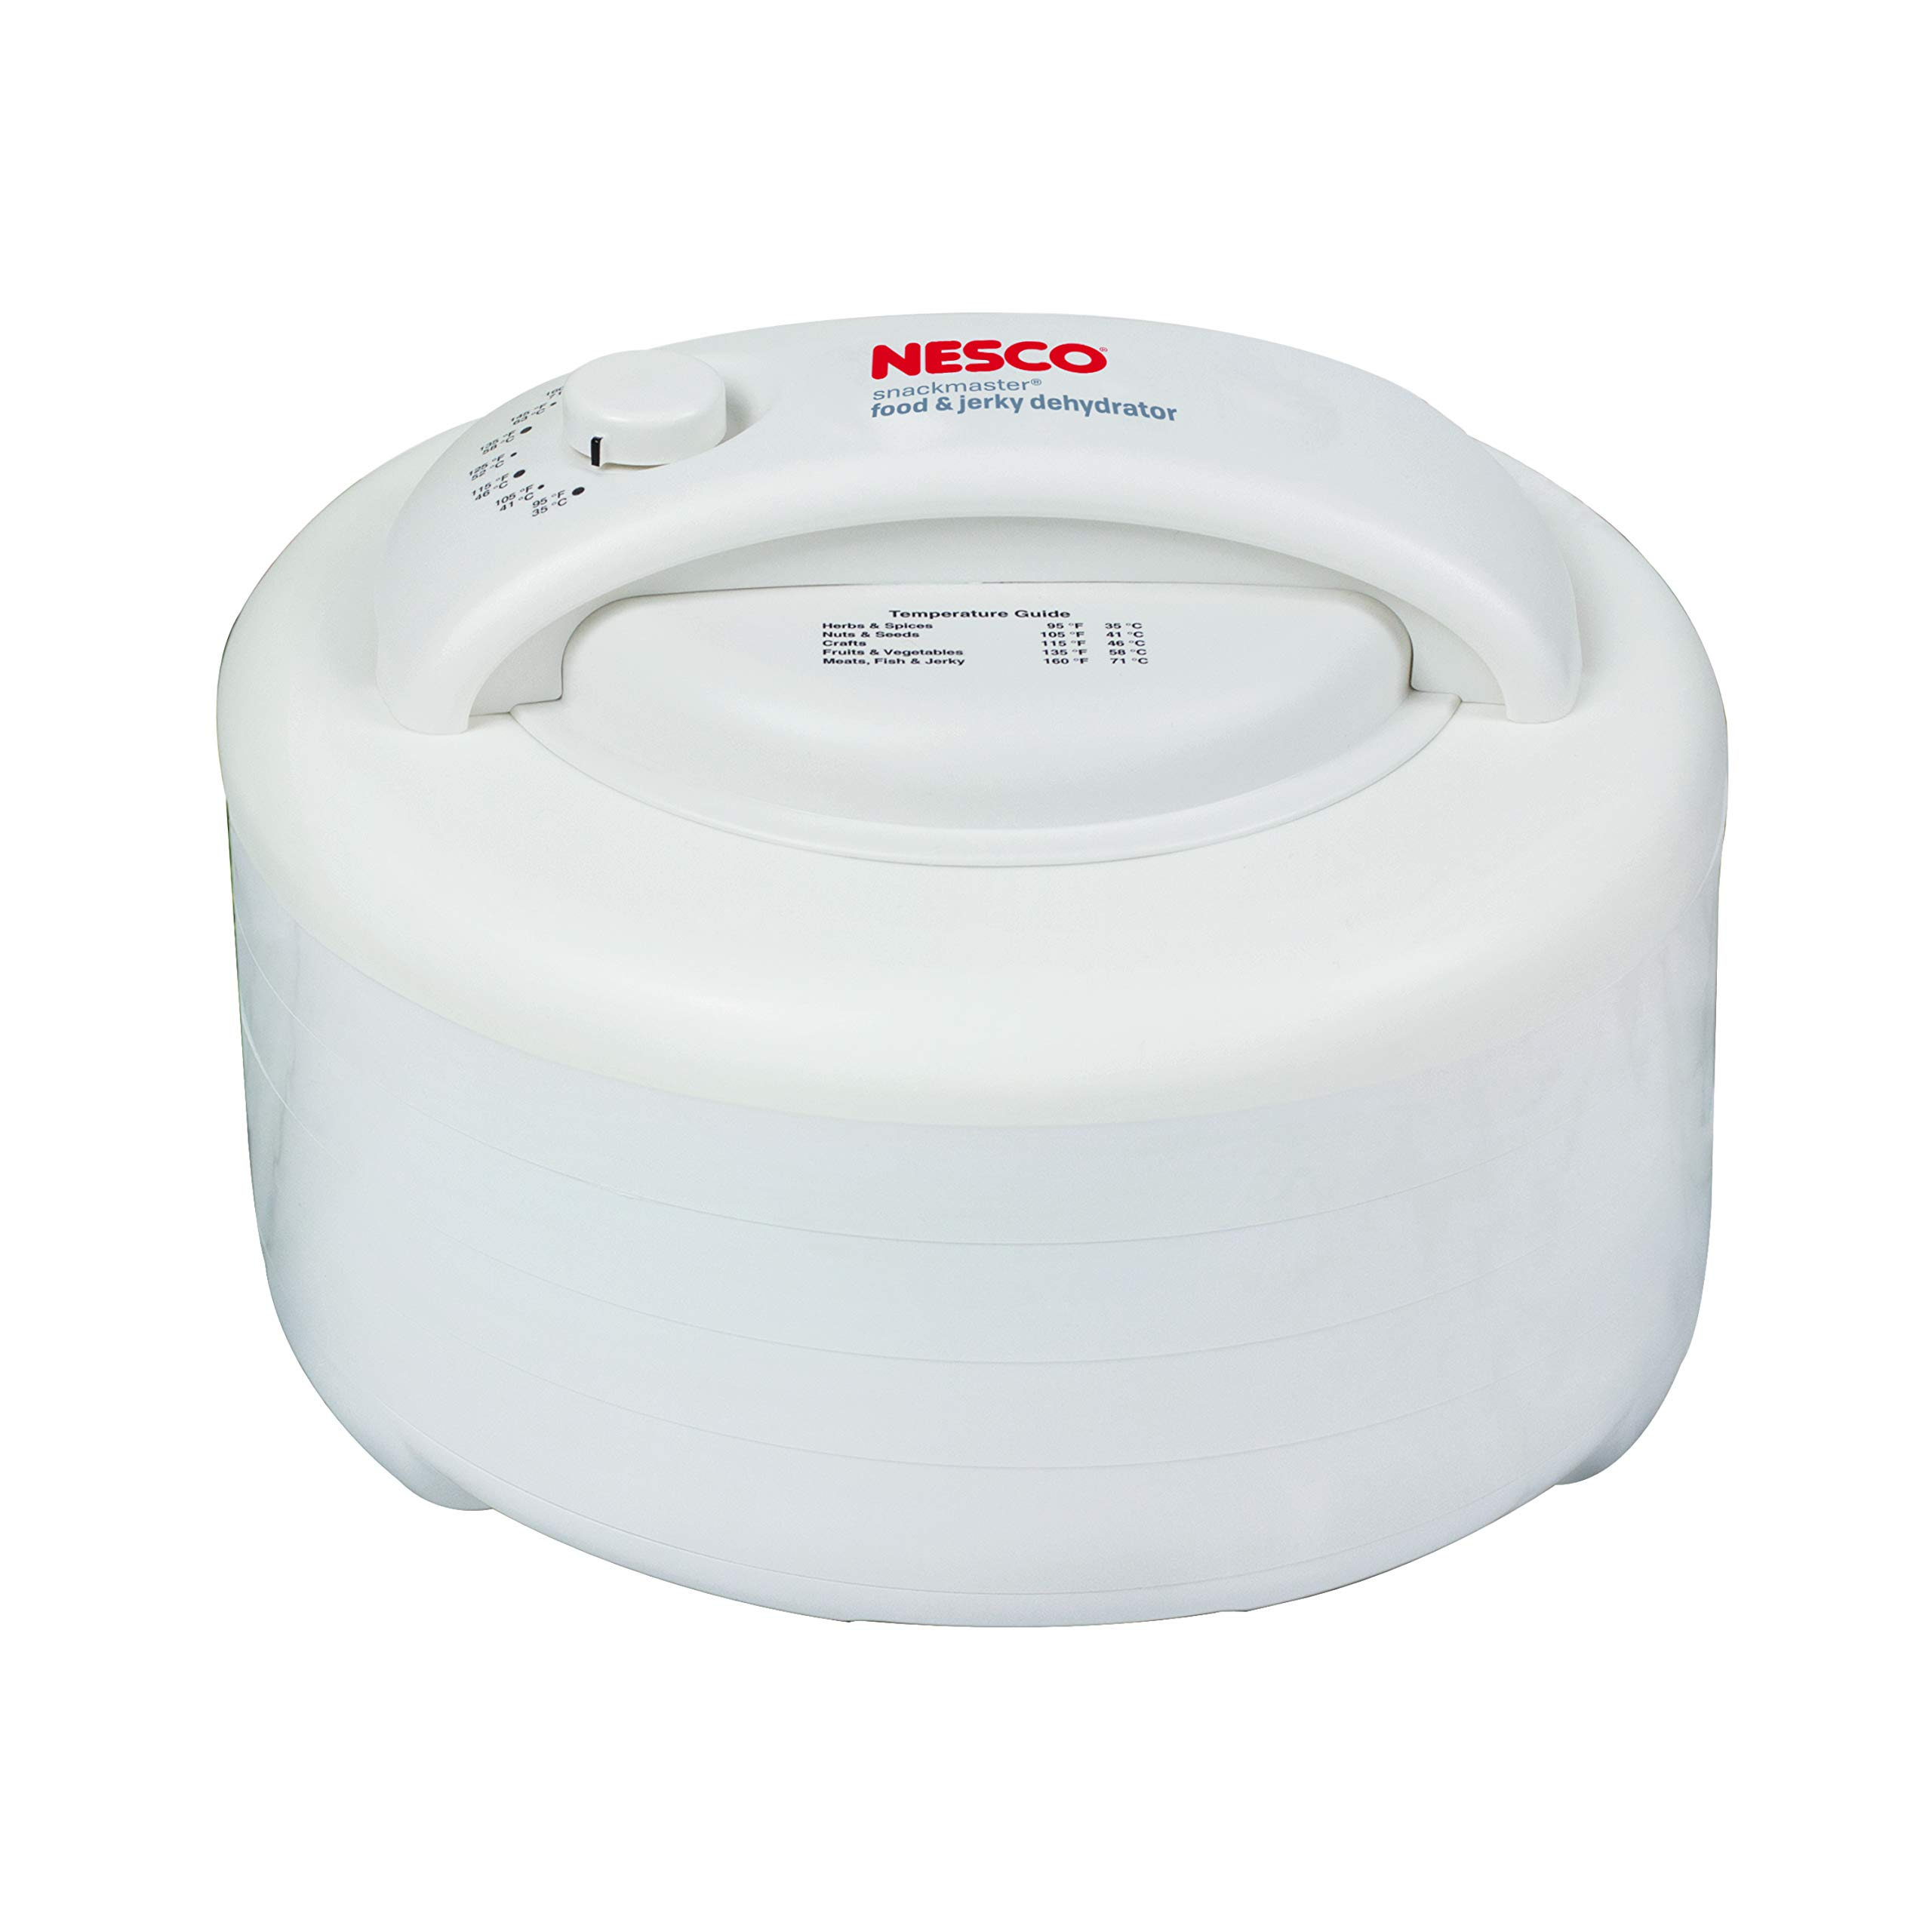 NESCO FD-60, Snackmaster Express Food Dehydrator, White, 500 watts by Nesco